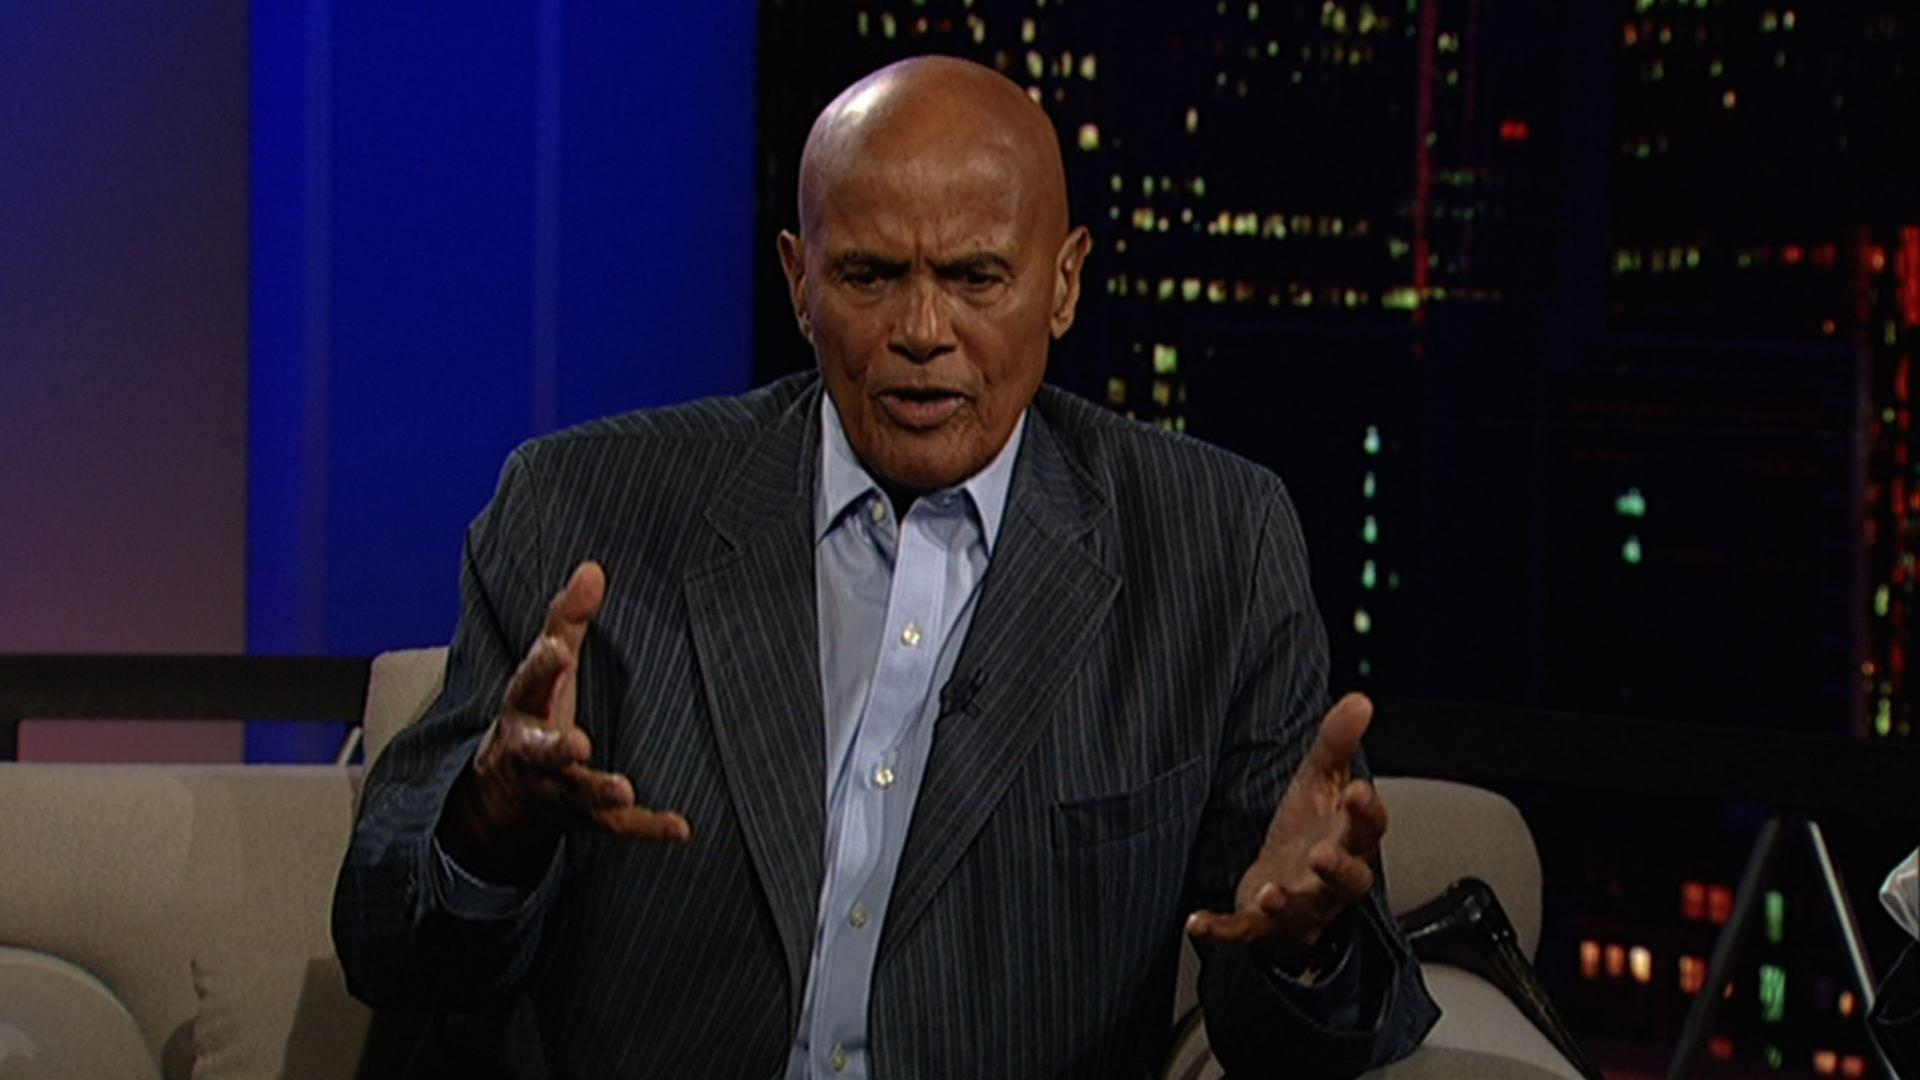 Actor-activist Harry Belafonte, Part 1 image